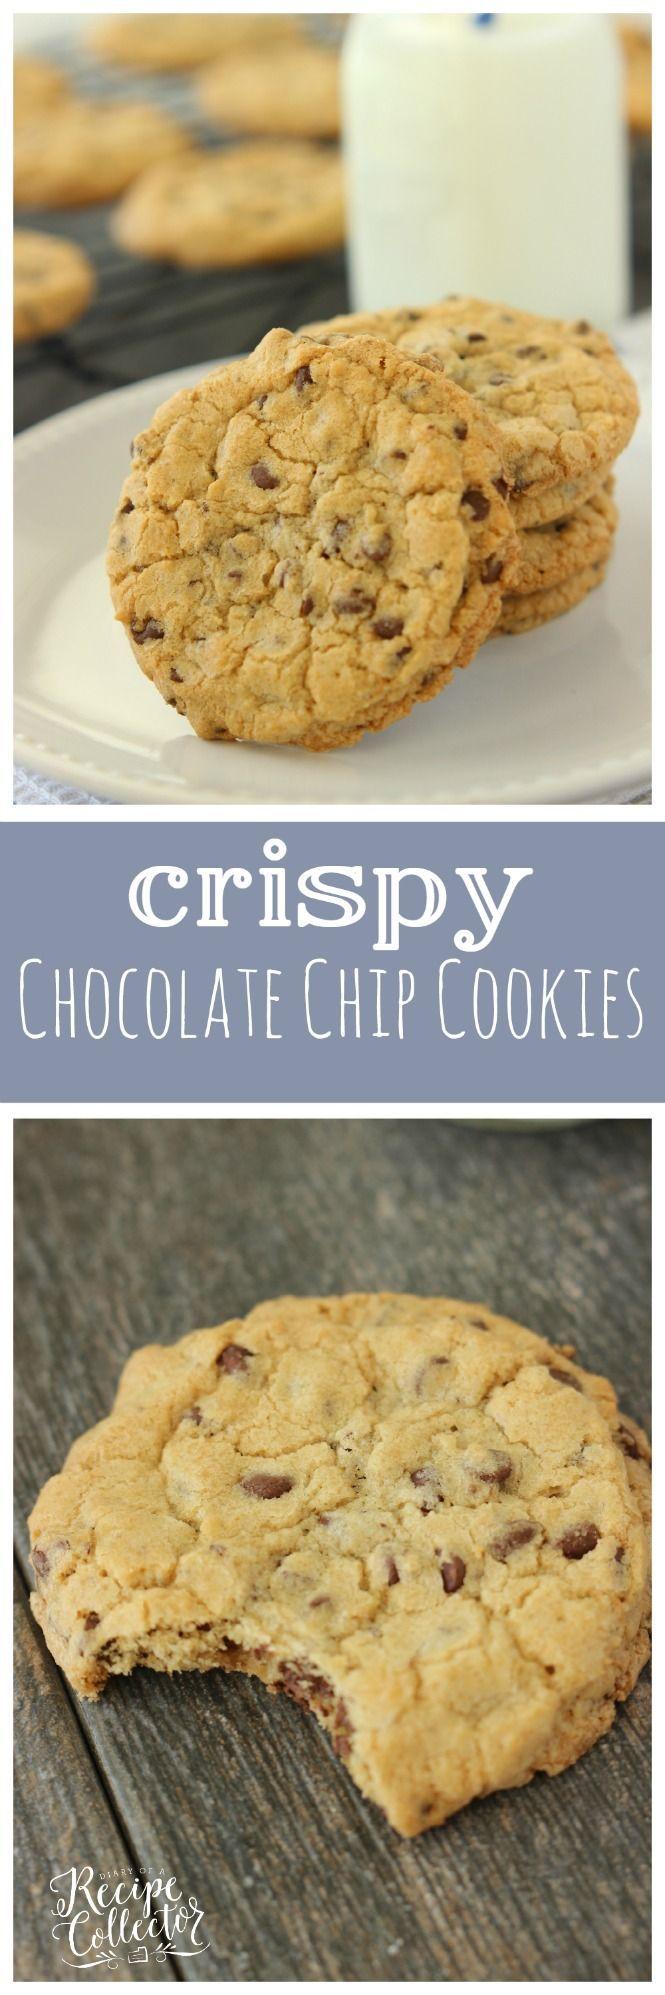 Best 10+ Crispy chocolate chip cookies ideas on Pinterest ...